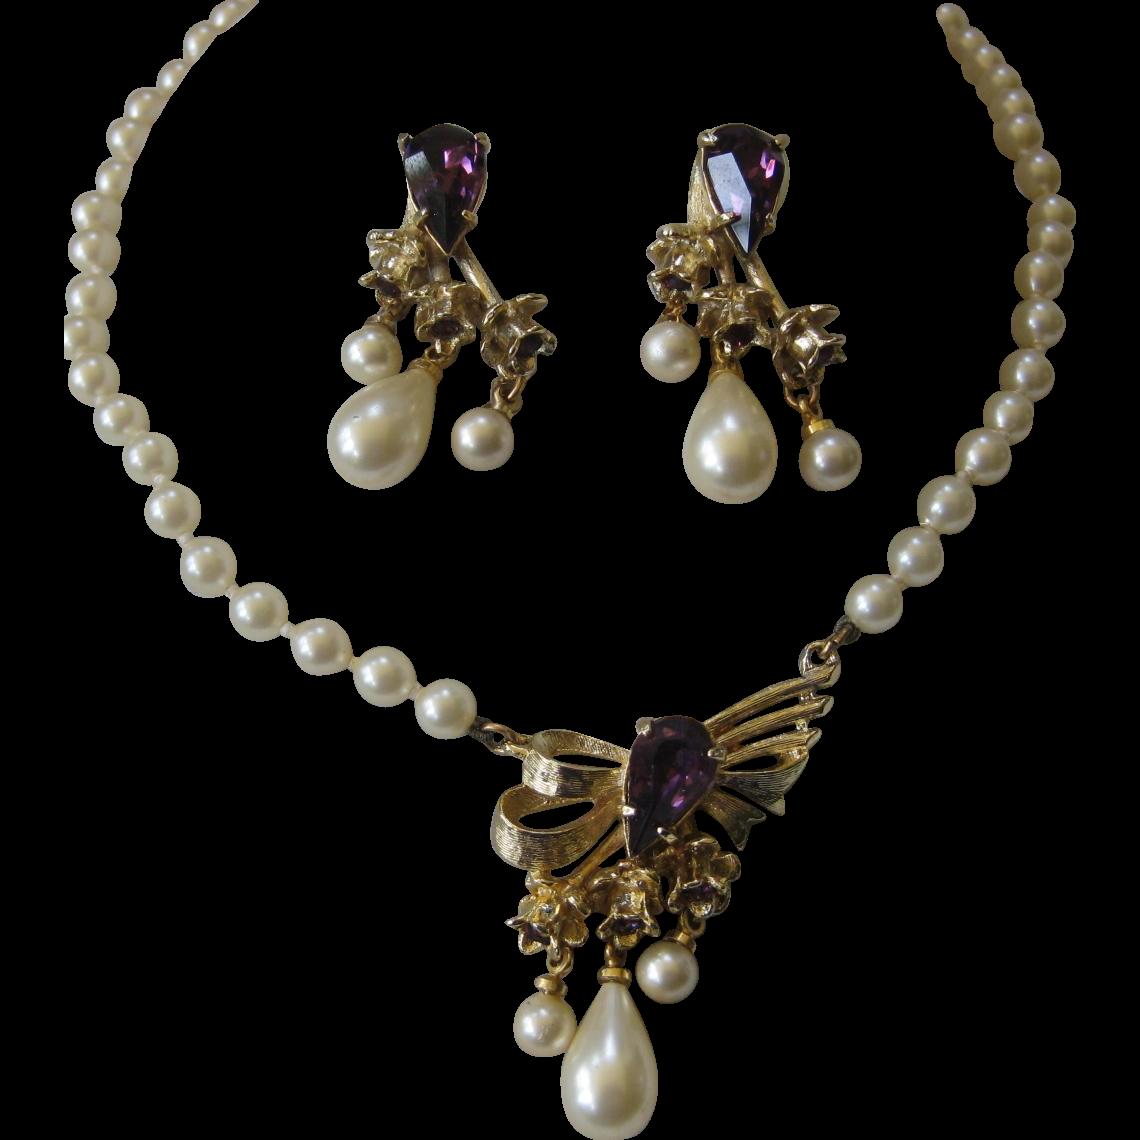 HOBE Delicate Glass Pearls & Amethyst Rhinestones Demi Parure